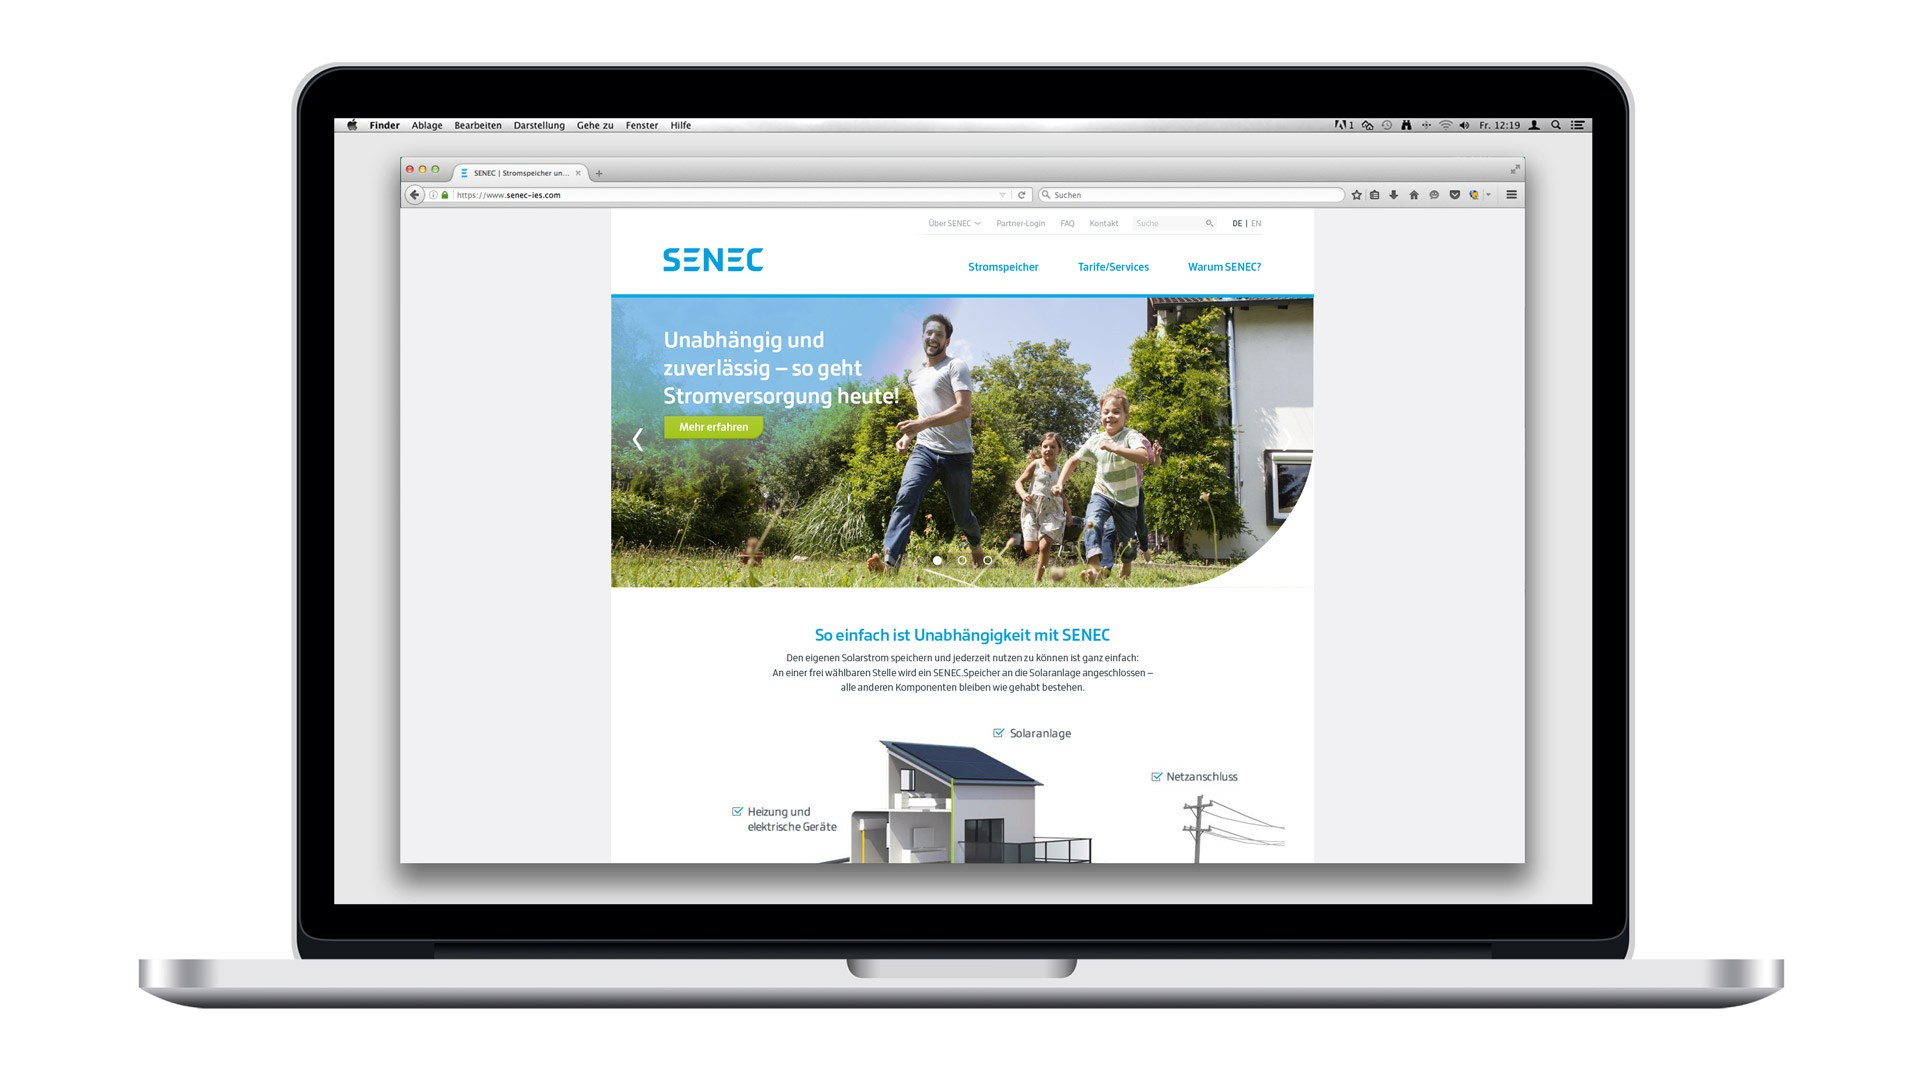 SENEC Digital - Startseite